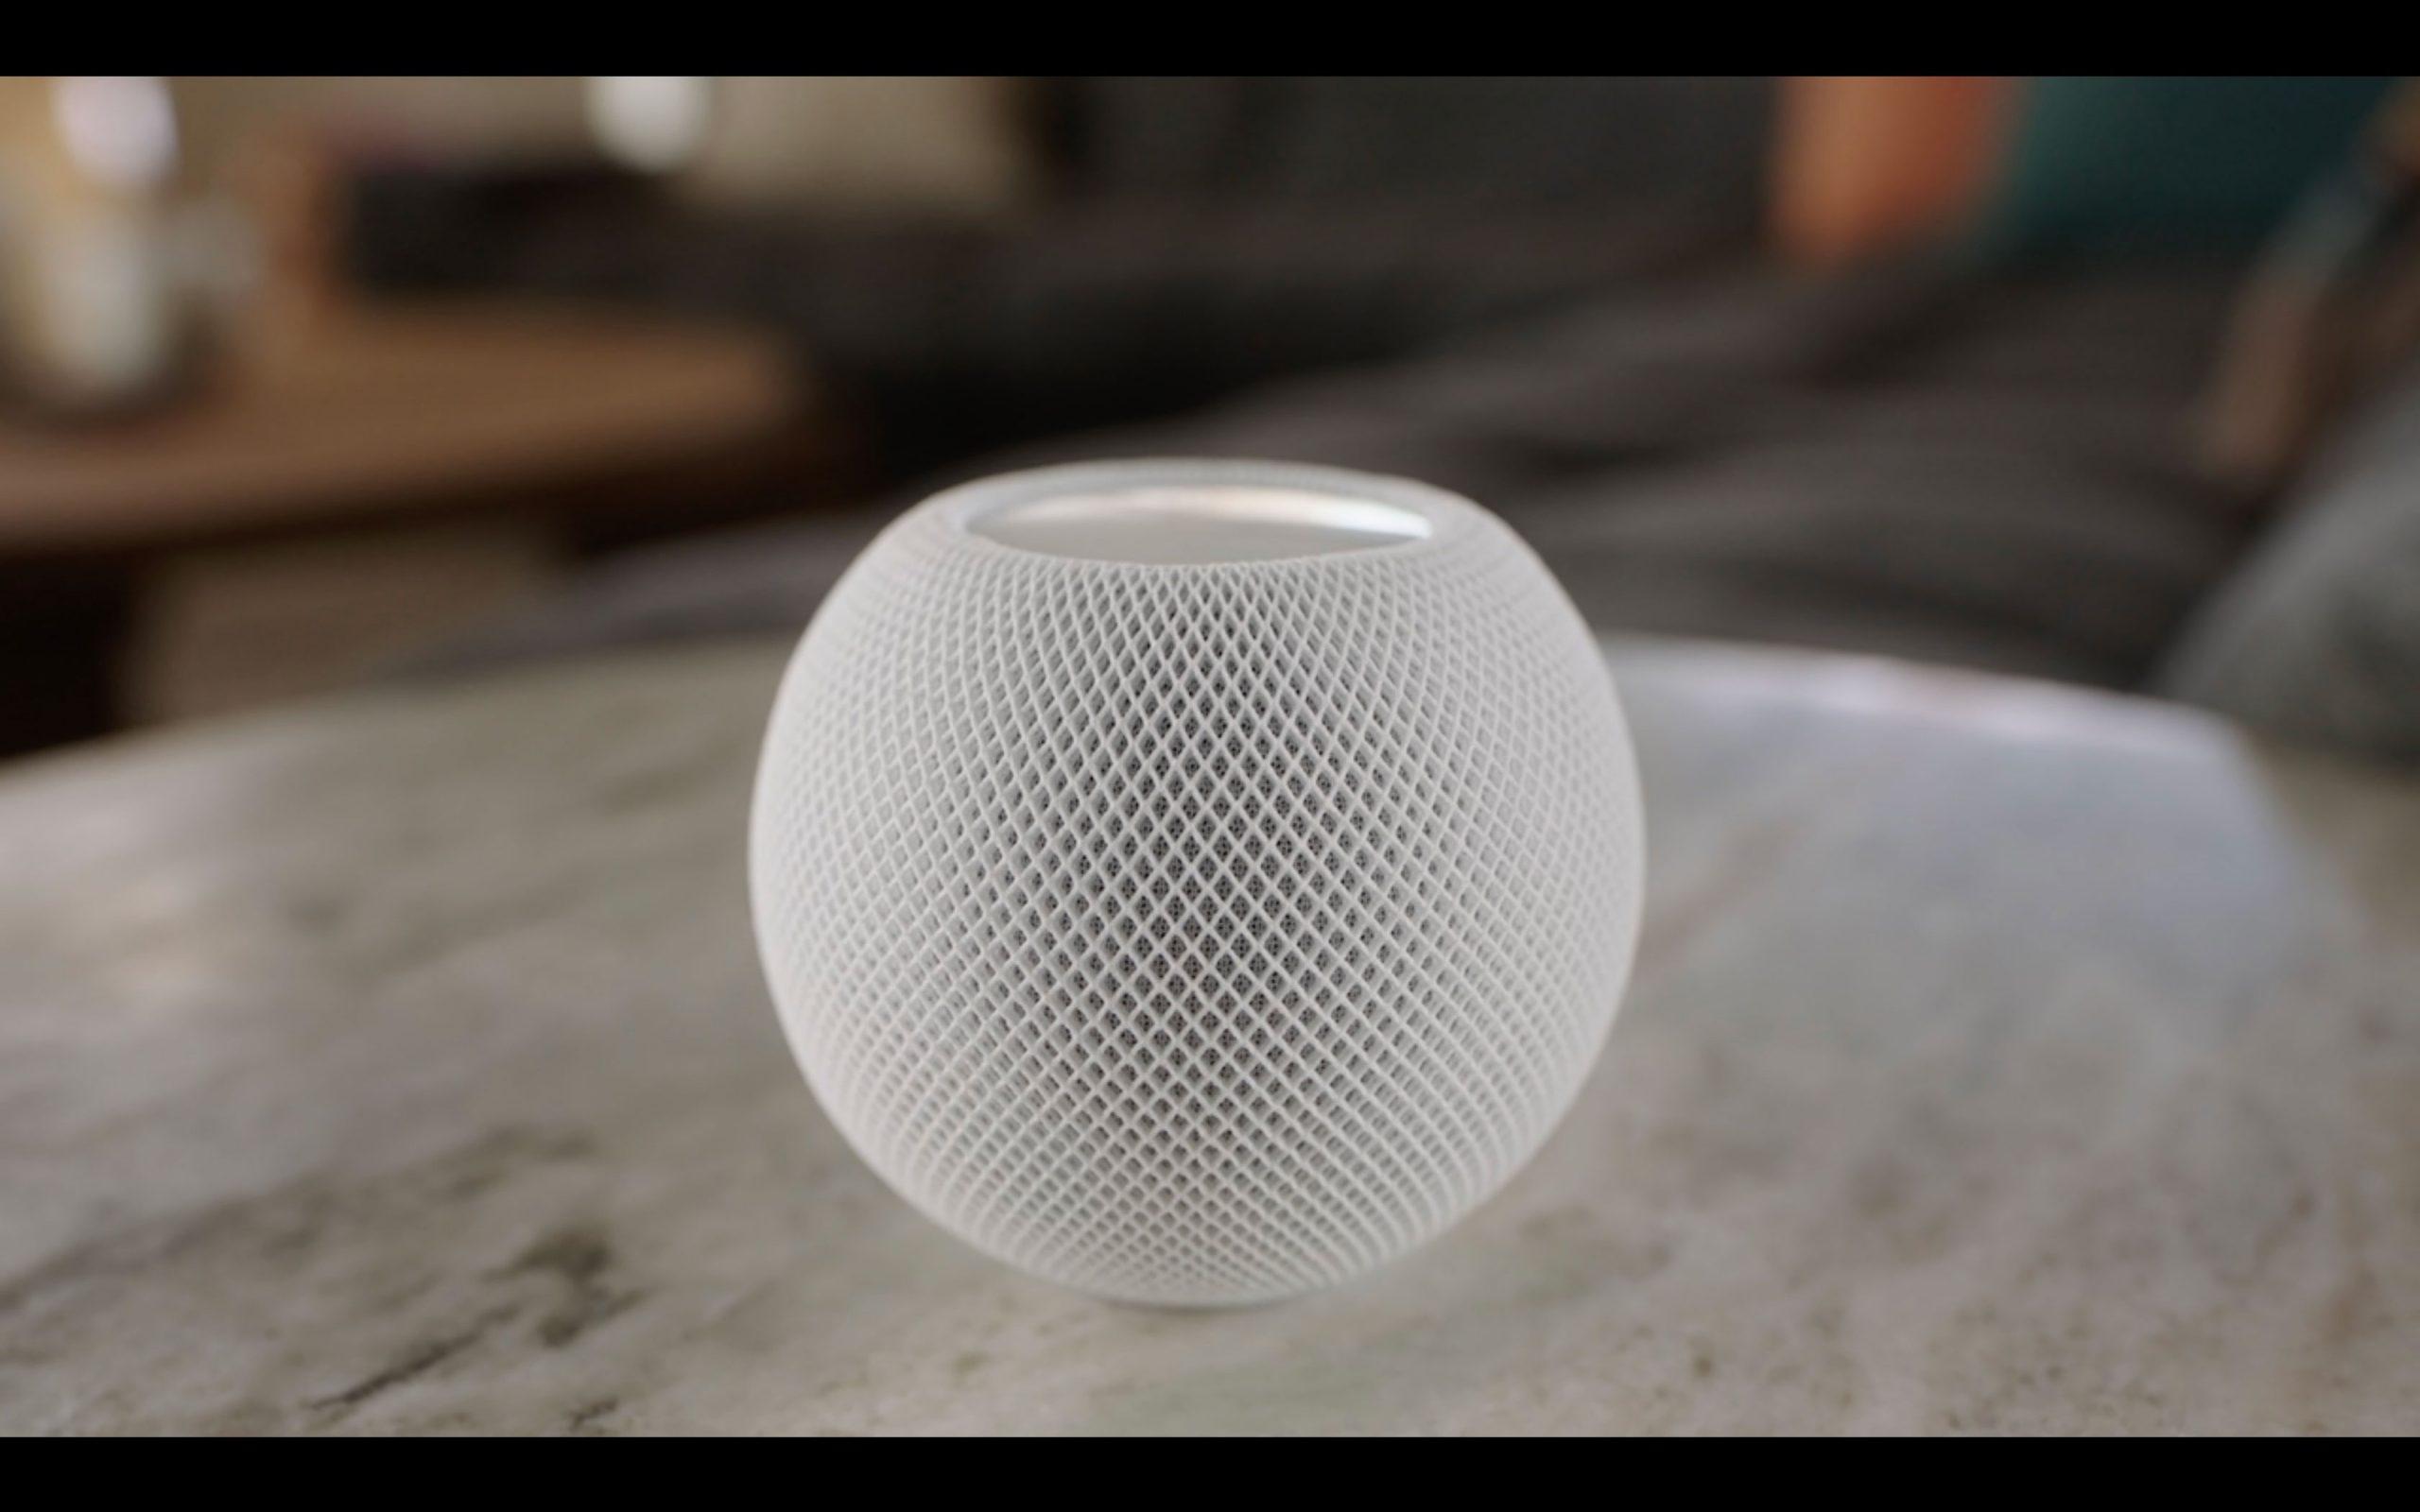 Le HomePod Mini en version blanche